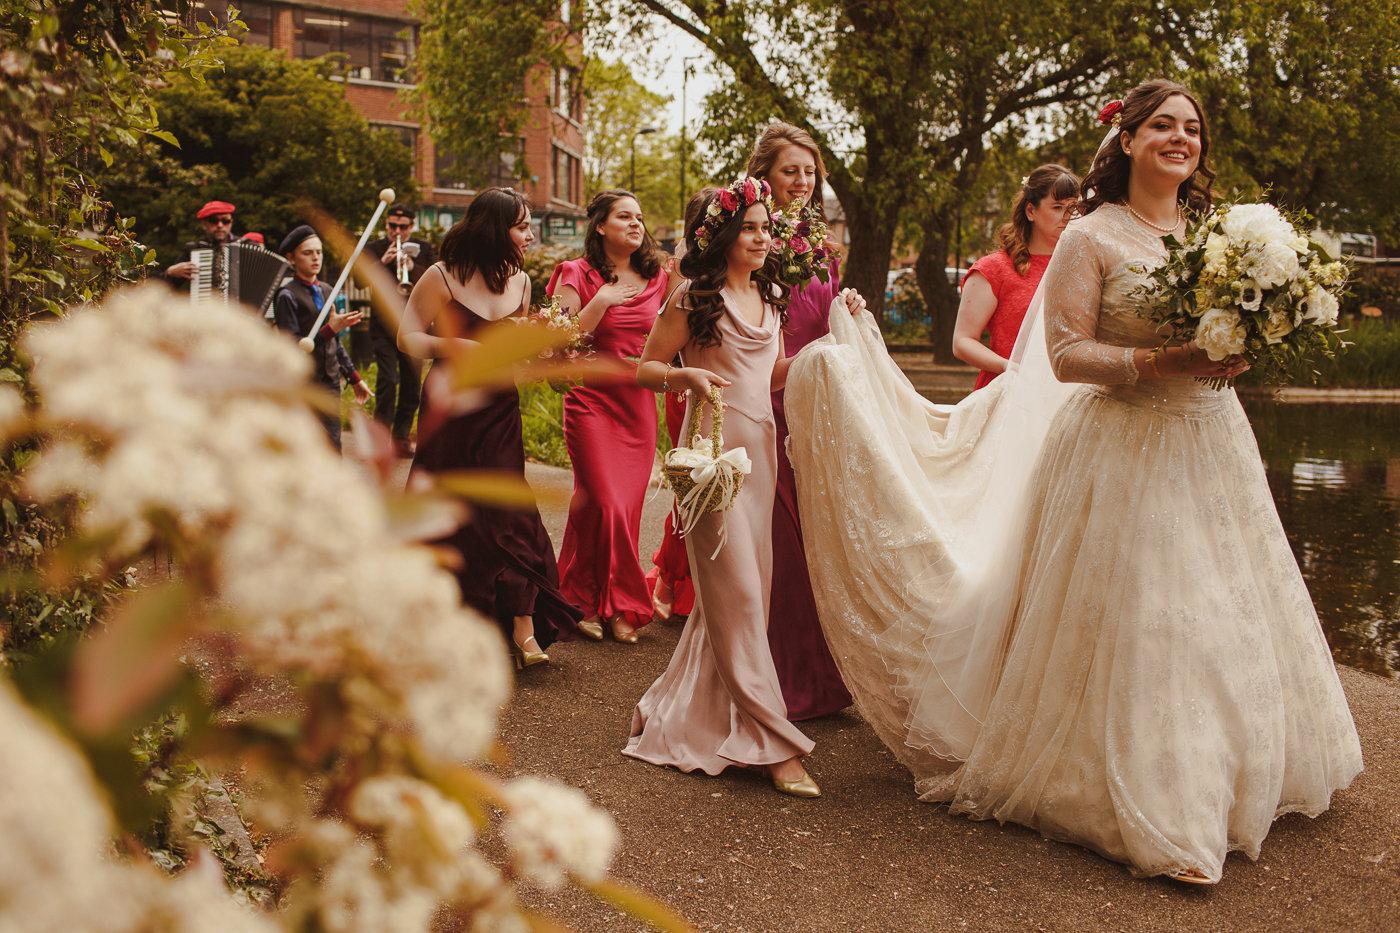 jewish-wedding-photographer-london-11.jpg